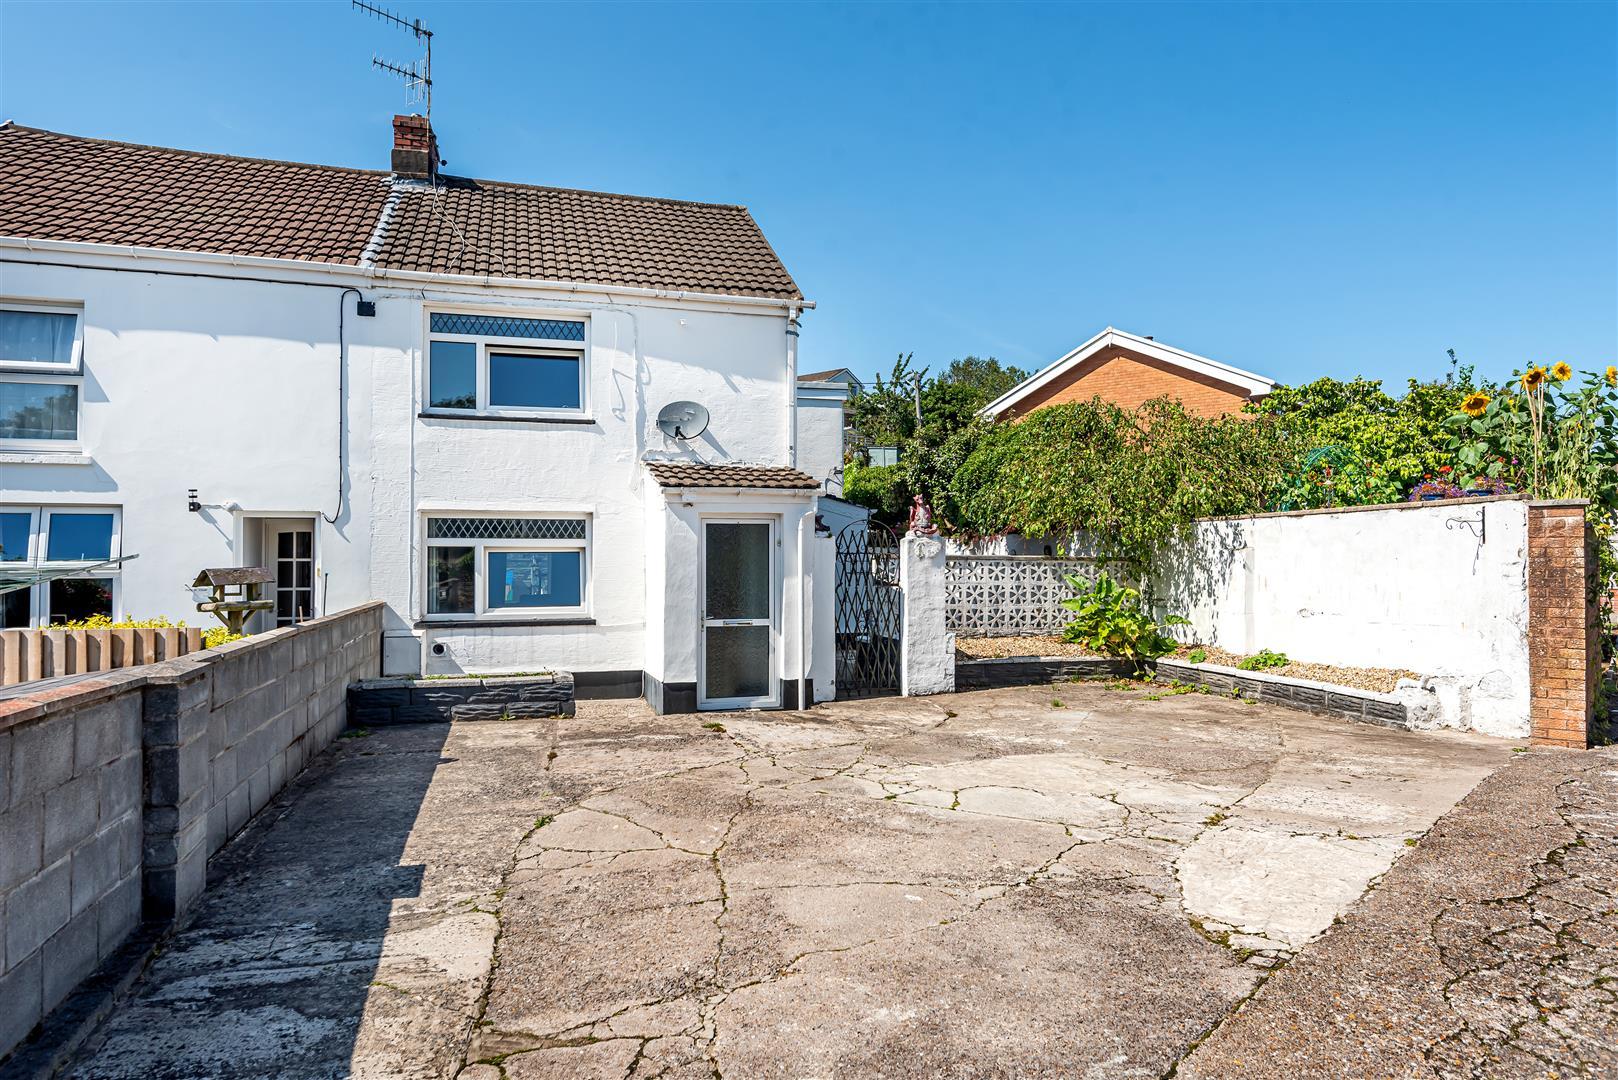 Hebron Close, Clydach, Swansea, SA6 5EG